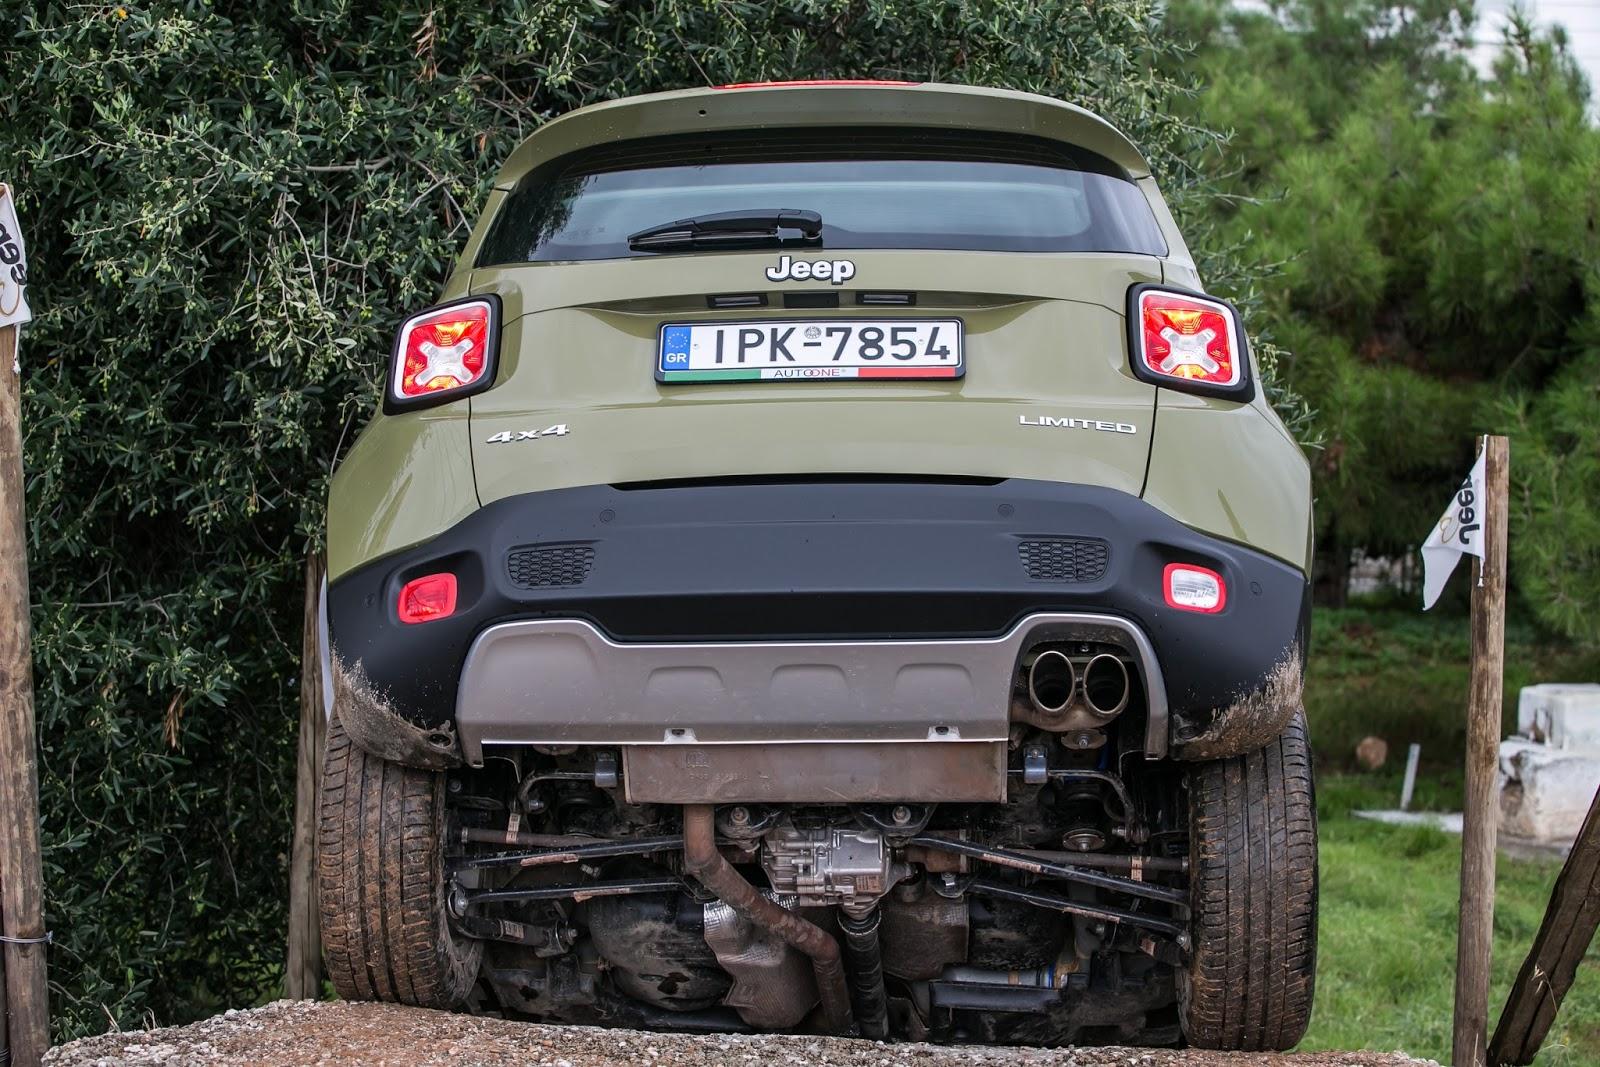 KF 1506 Πετάμε ένα Jeep Renegade σε λάσπες, πέτρες, άμμο, λίμνες. Θα τα καταφέρει; Jeep, Jeep Renegade, Renegade, SUV, TEST, zblog, ΔΟΚΙΜΕΣ